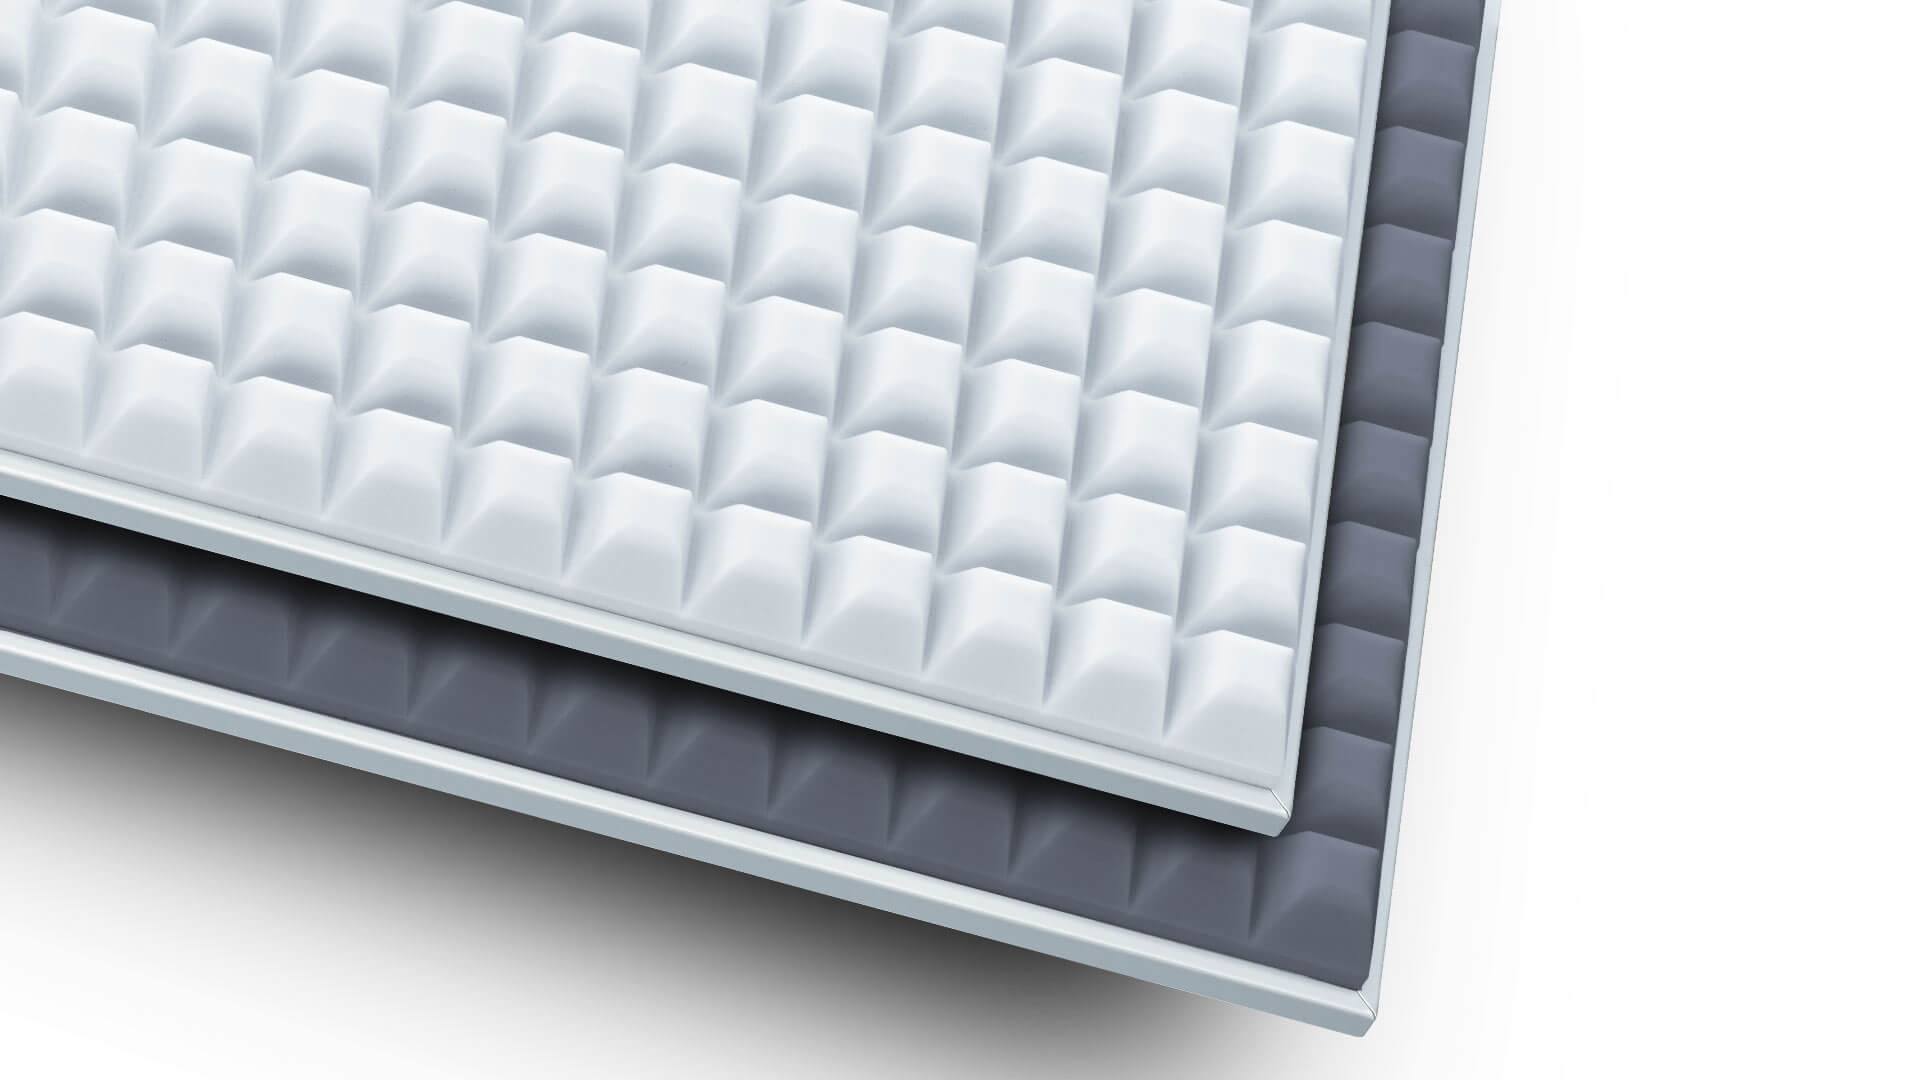 aixFOAM sound insulation - premium absorbers for maximum sound insulation